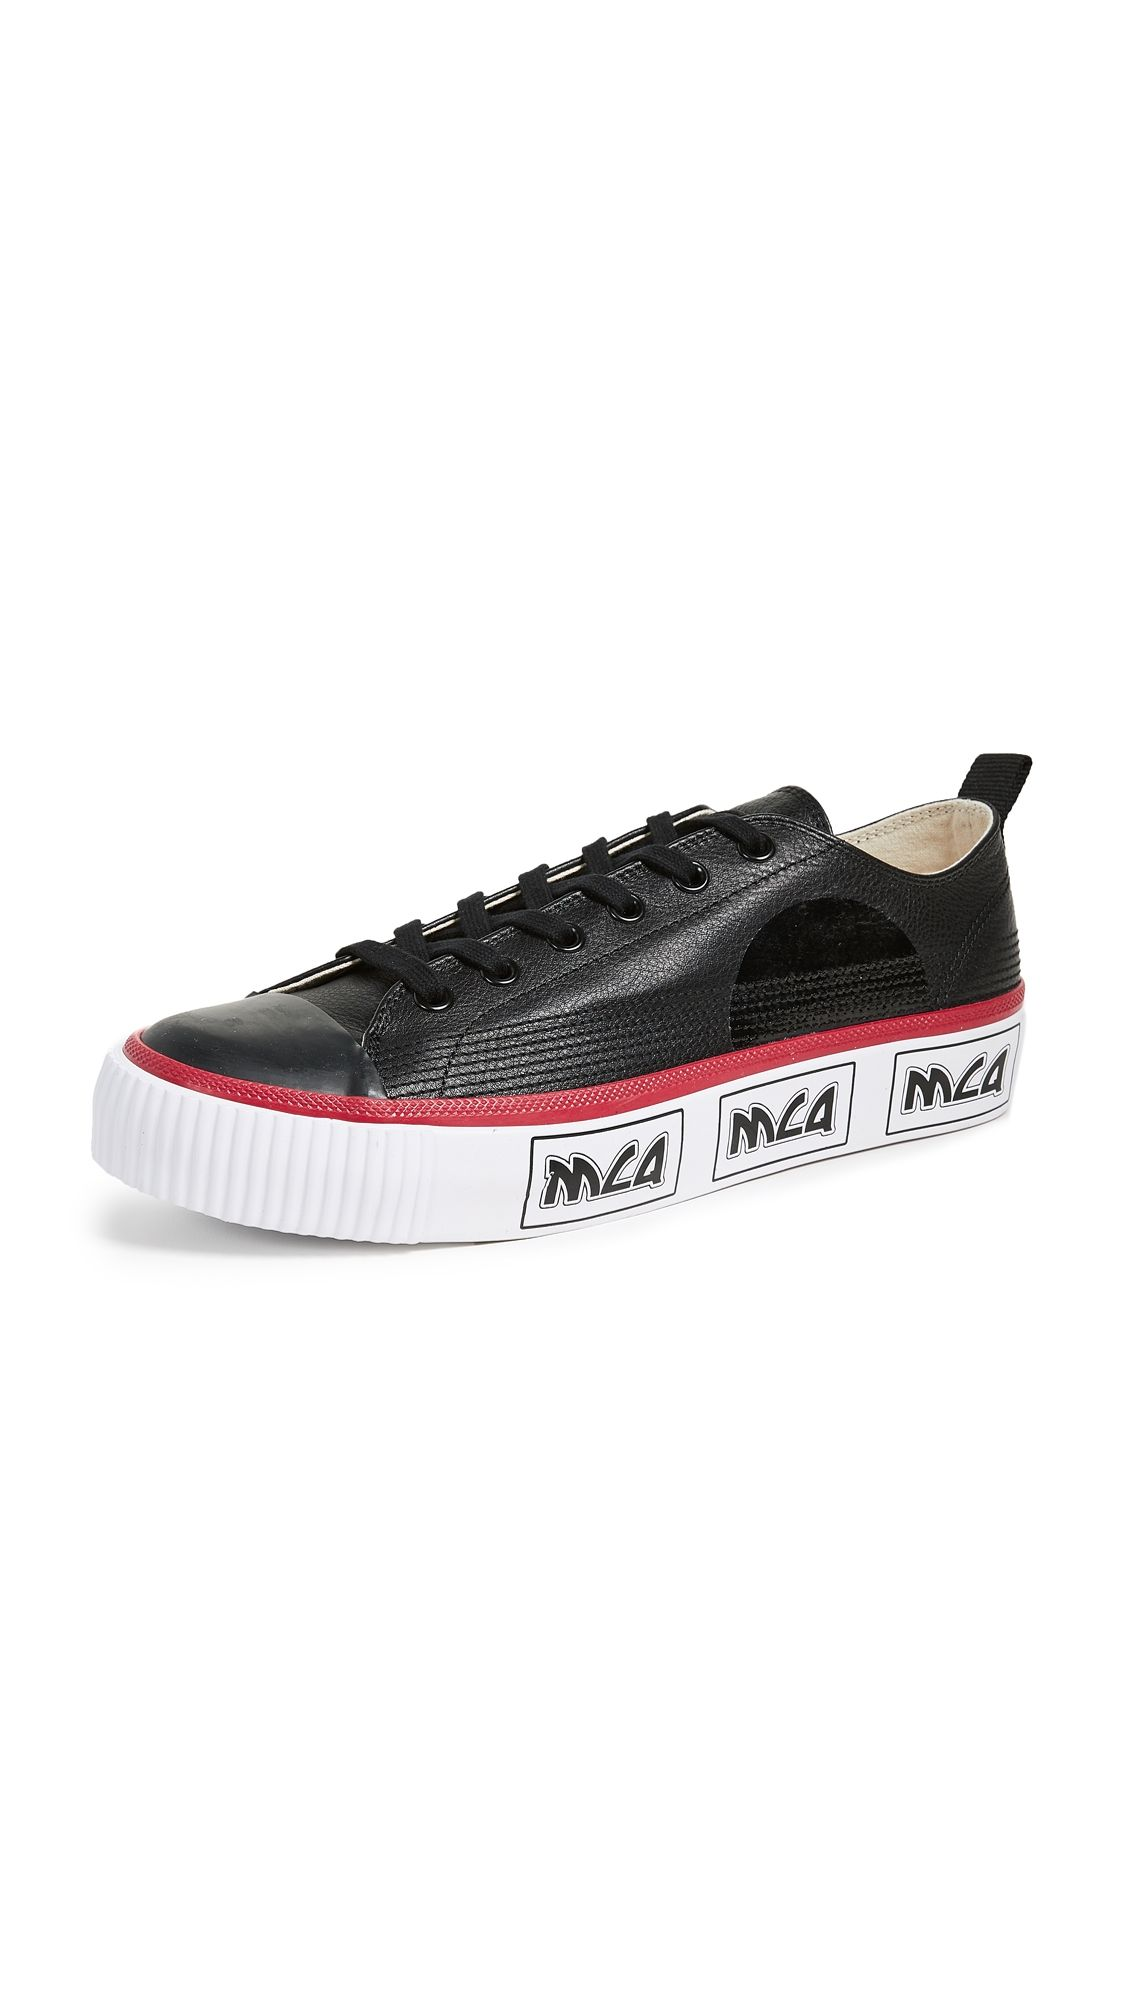 Mcq Alexander By Low Sneakers Top Mcqueen Plimsoll Platform l1JFKc